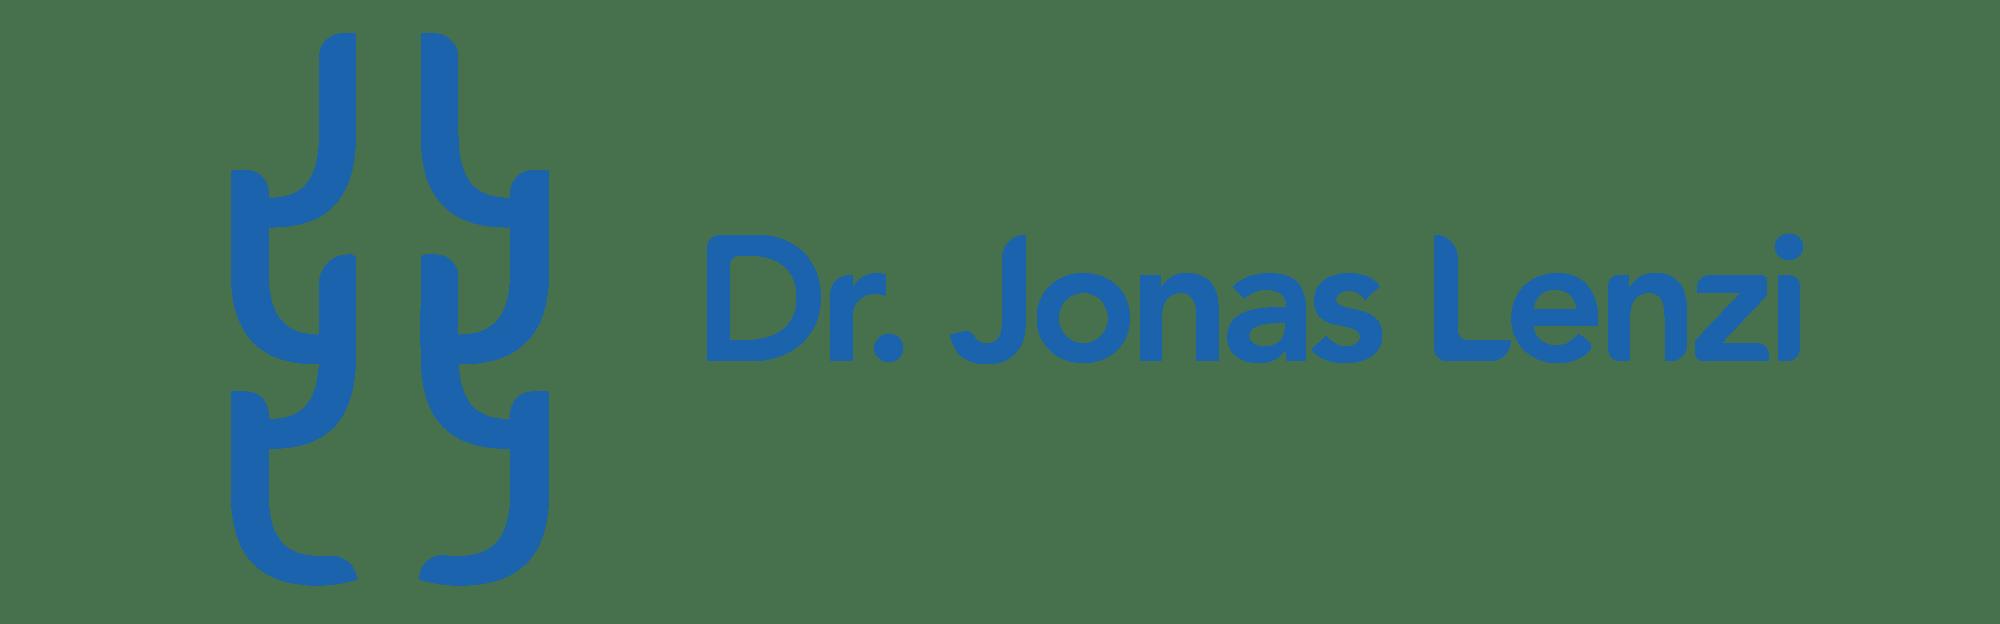 Dr Jonas Lenzi